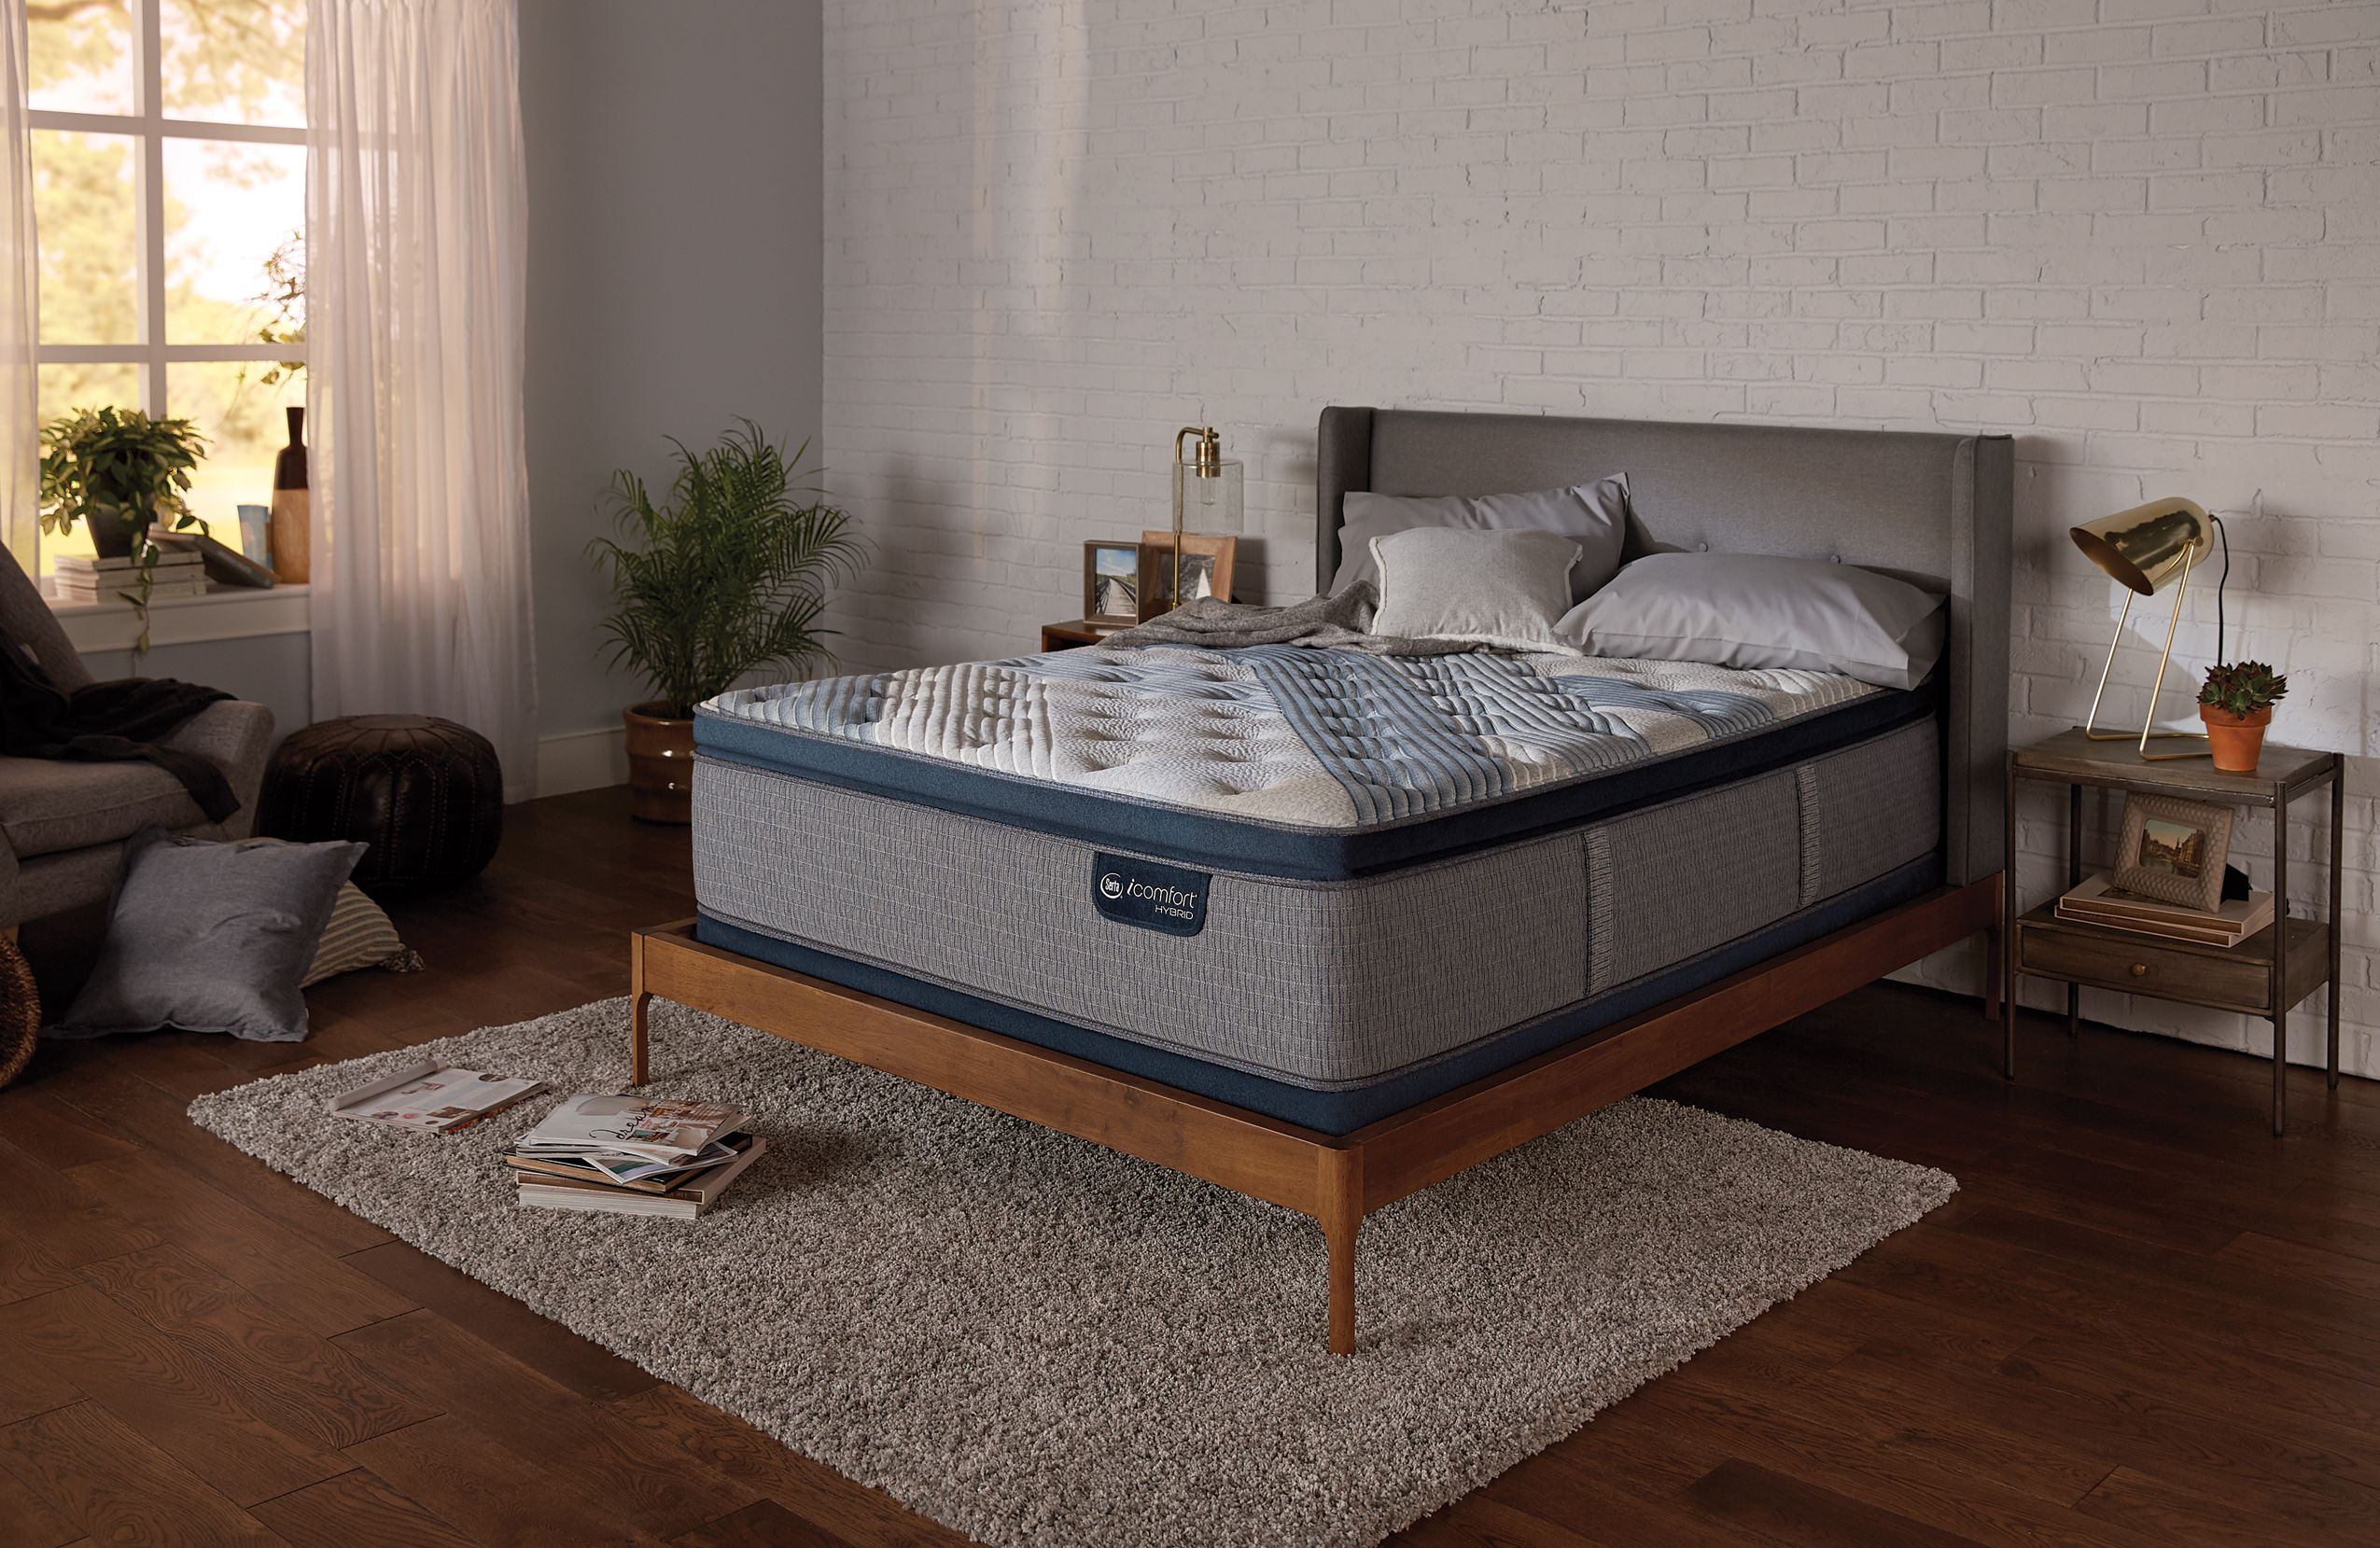 Serta Icomfort Blue Fusion 1000 Luxury Firm Pillow Top Set Plush Pillows Twin Xl Mattress Serta Mattress